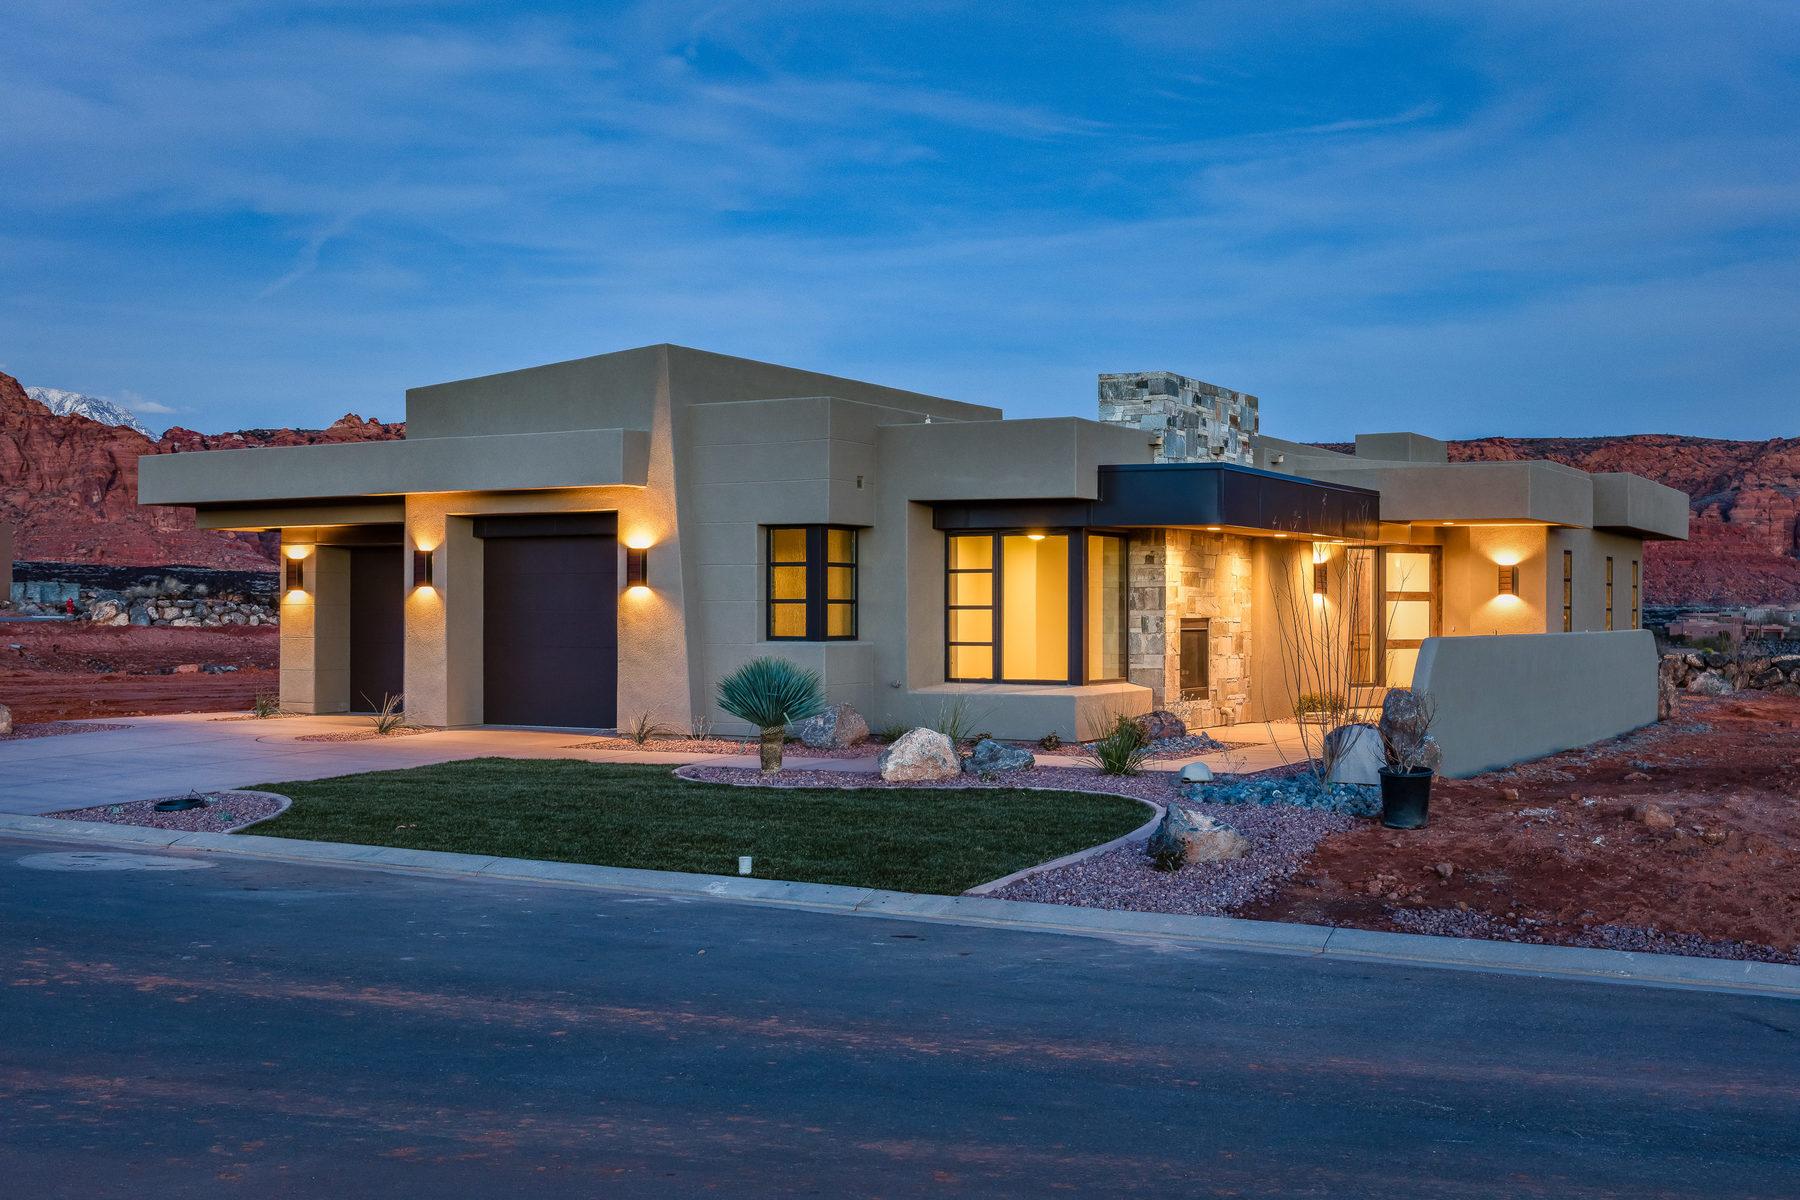 Villa per Vendita alle ore New Encanto Home in Southern Utah 1355 E Snow Canyon Parkway Lot 20 Ivins, Utah, 84738 Stati Uniti